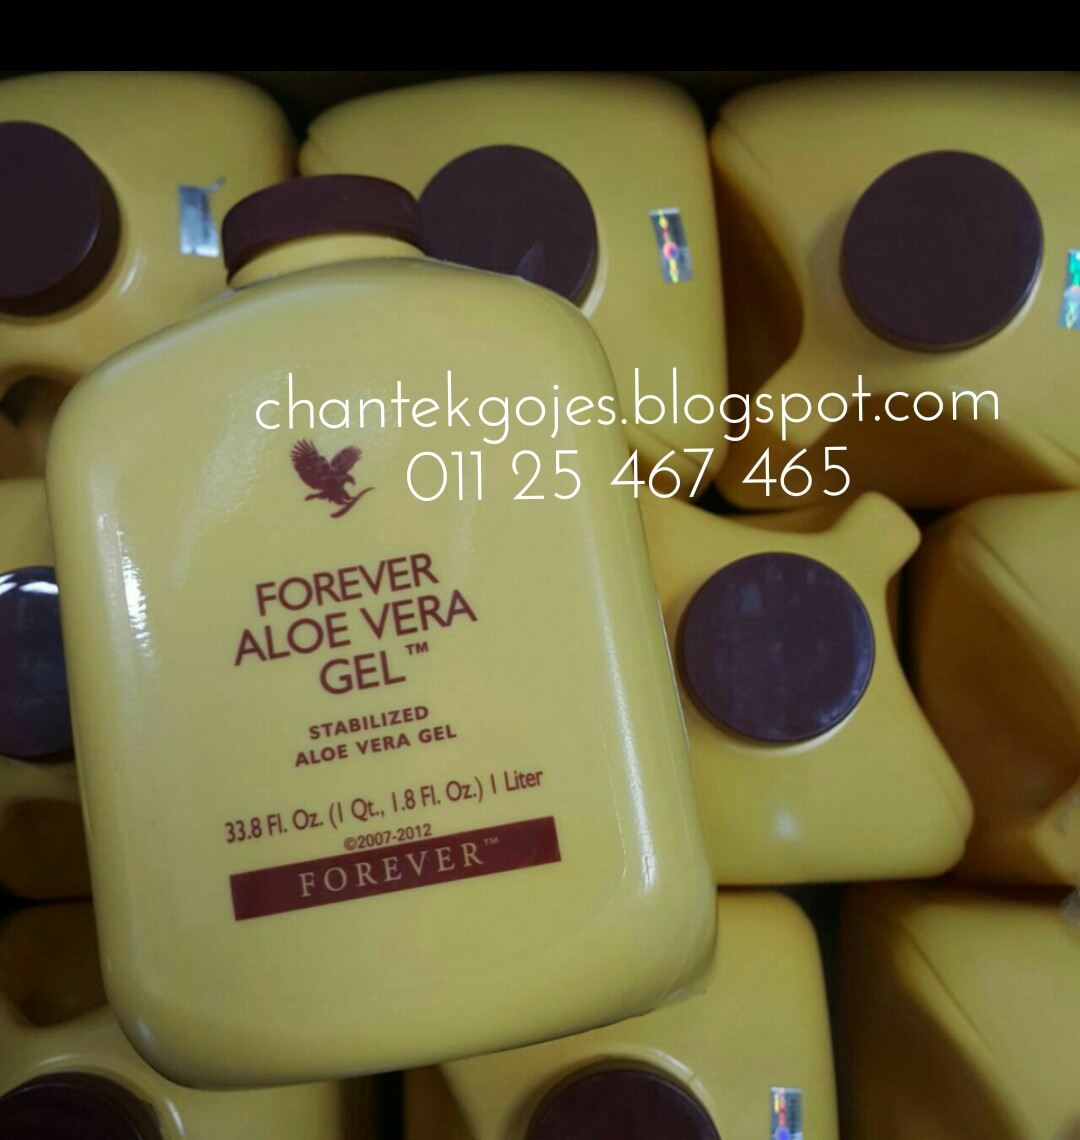 chantekgojes aloevera gel forever detox secara alami